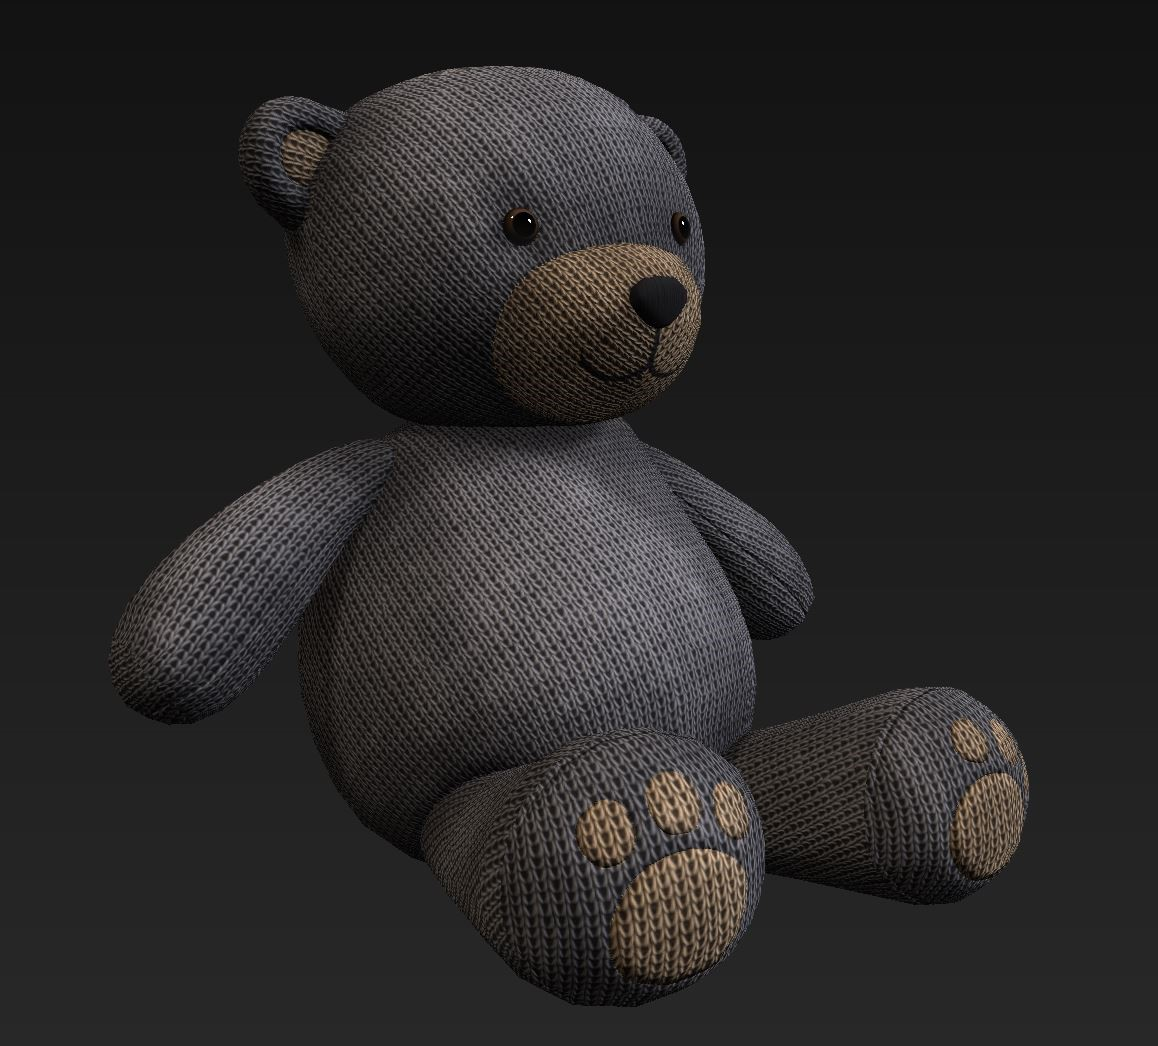 TeddyBear_60.JPG